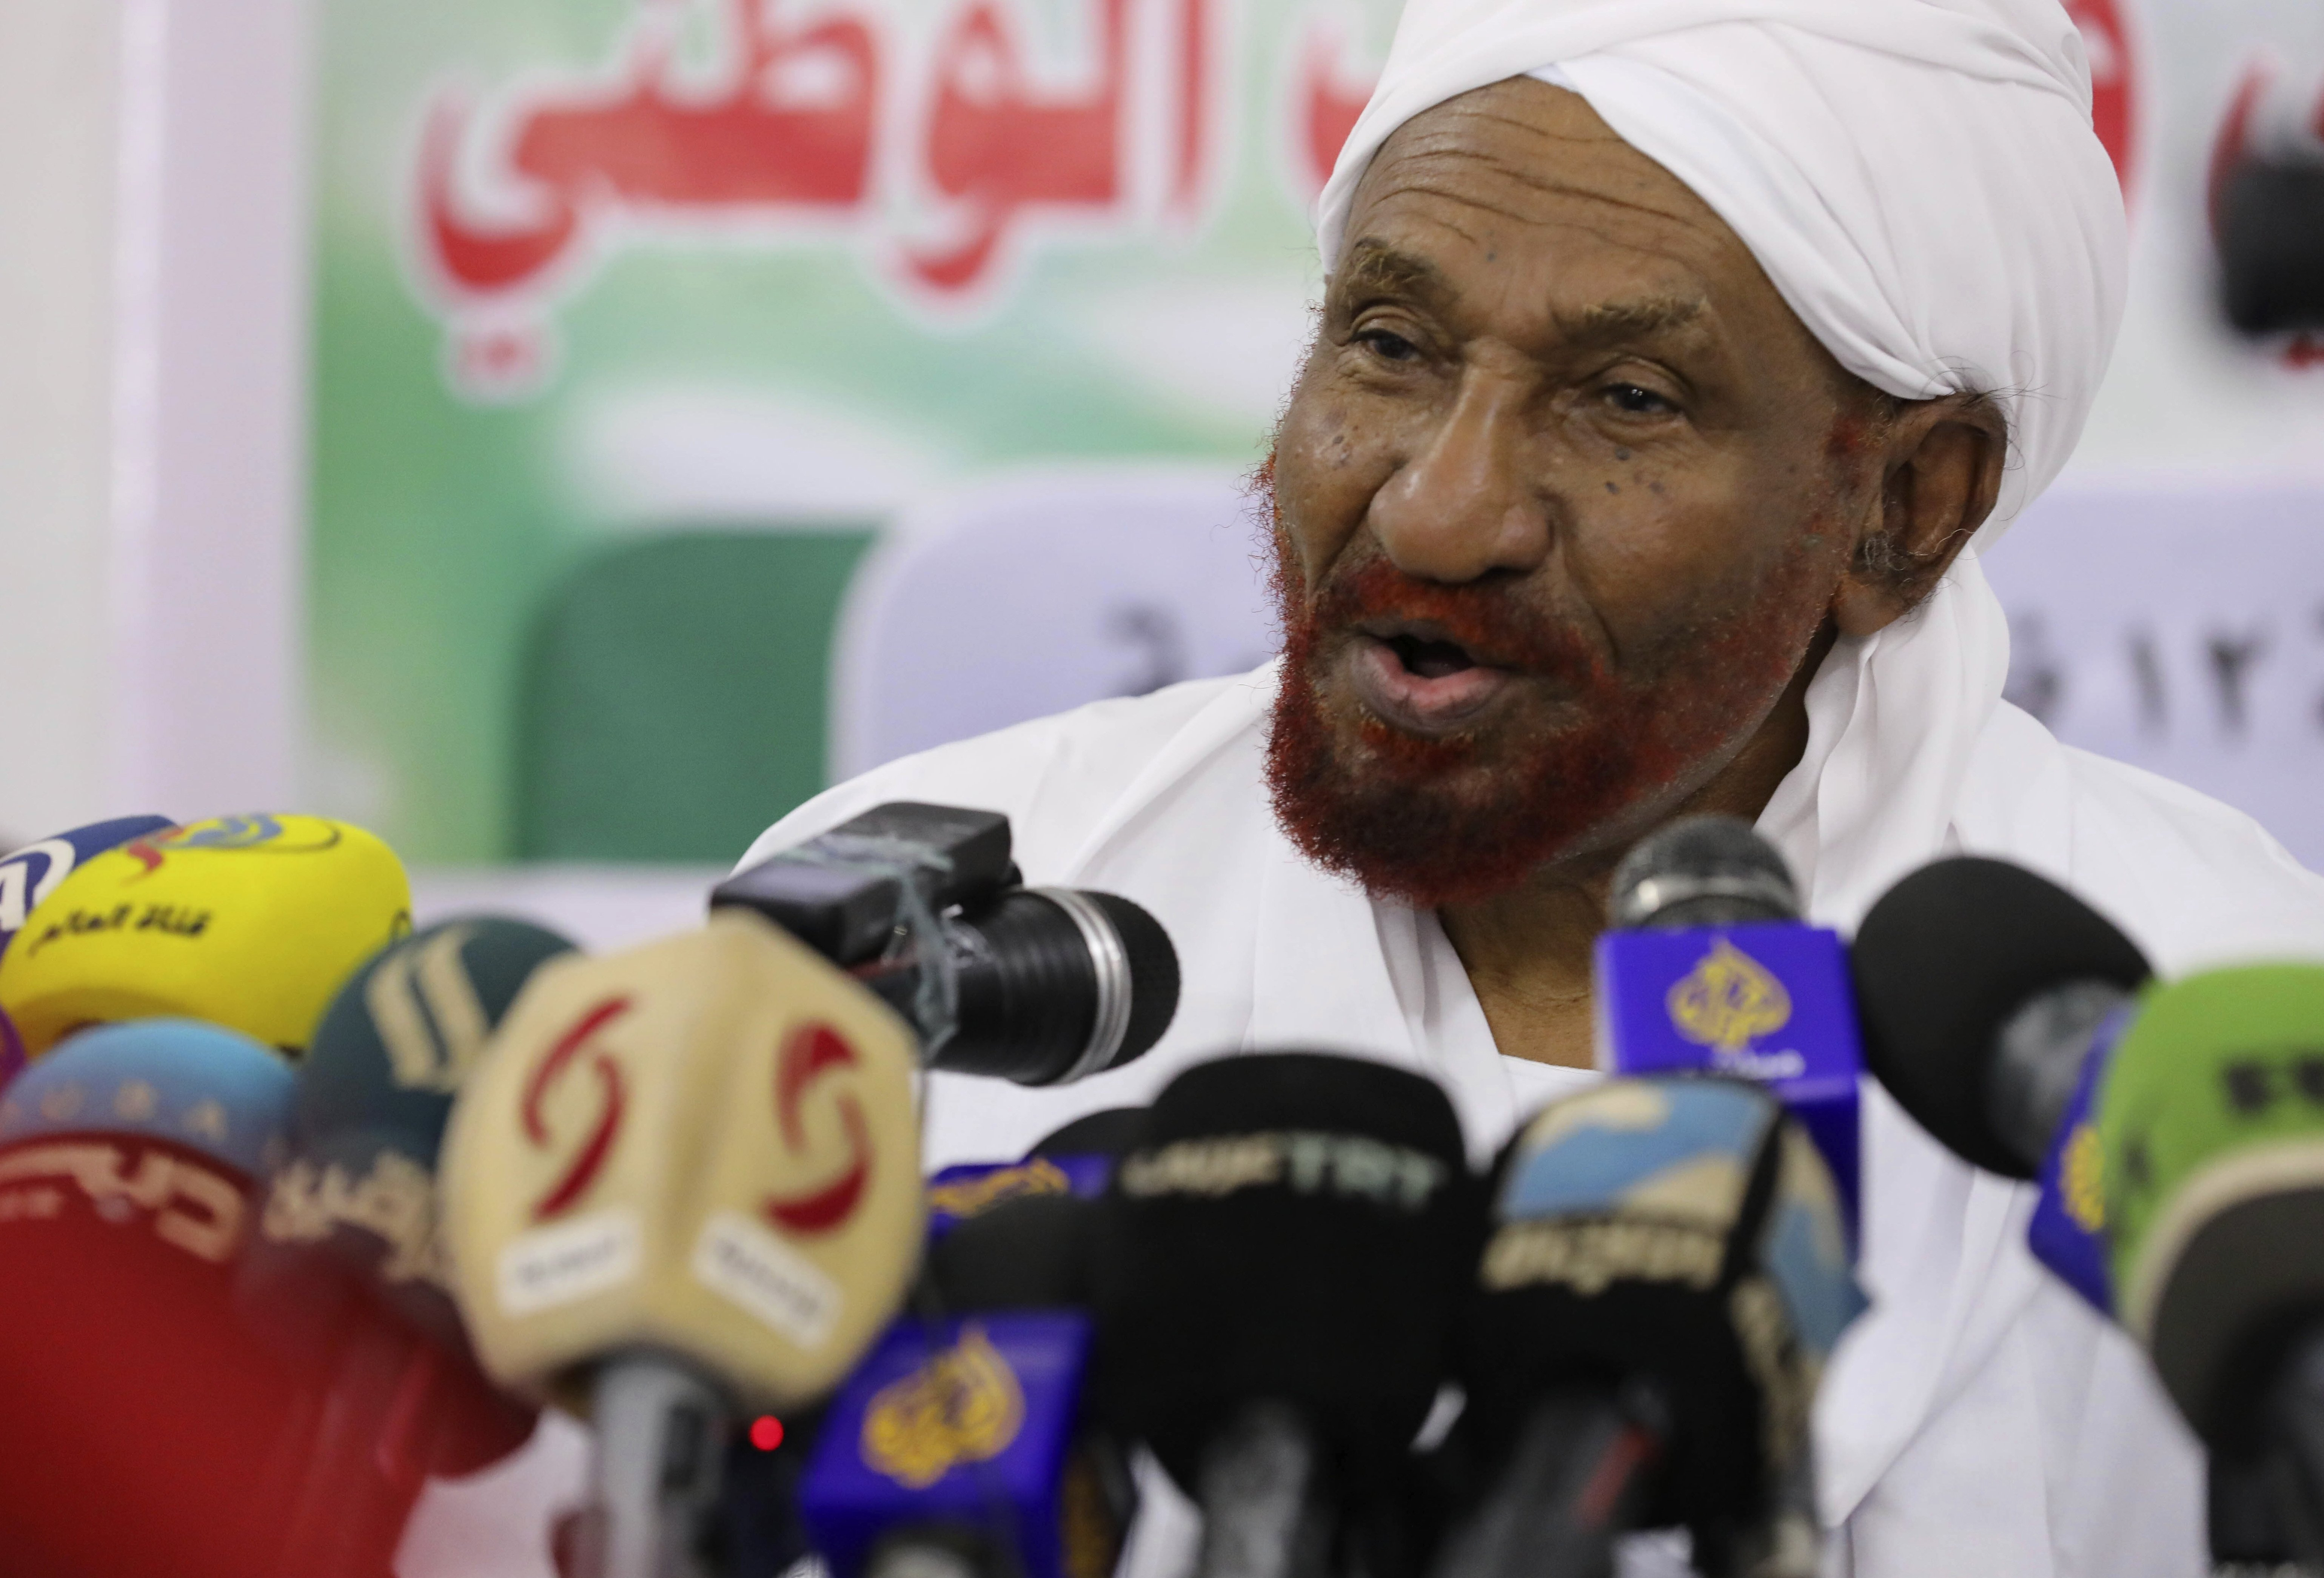 Former Sudanese Prime Minister Sadiq al-Mahdi, leader of the Umma political party, speaks during a news conference in Khartoum, Sudan, Feb. 6, 2020. (AP Photo/Marwan Ali, File)